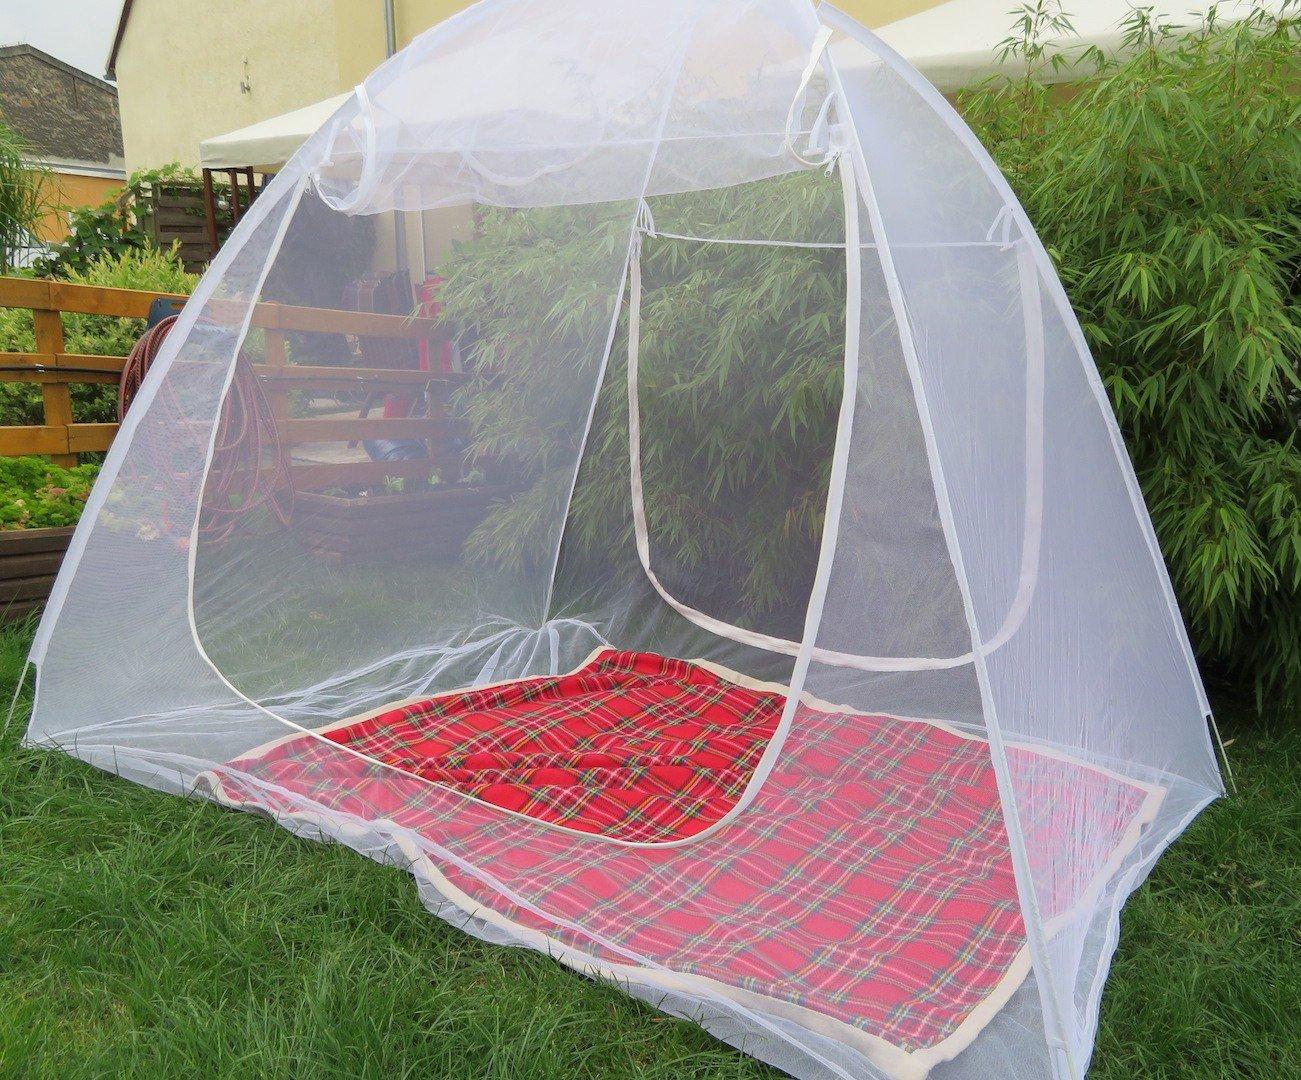 Red baldaquino de rejilla antimosquitos Mosquitera Dosel de Cama Pop Up Tienda S//o/® Mosquitera m/óvil 200/x 150/x 148/cm mosquitos